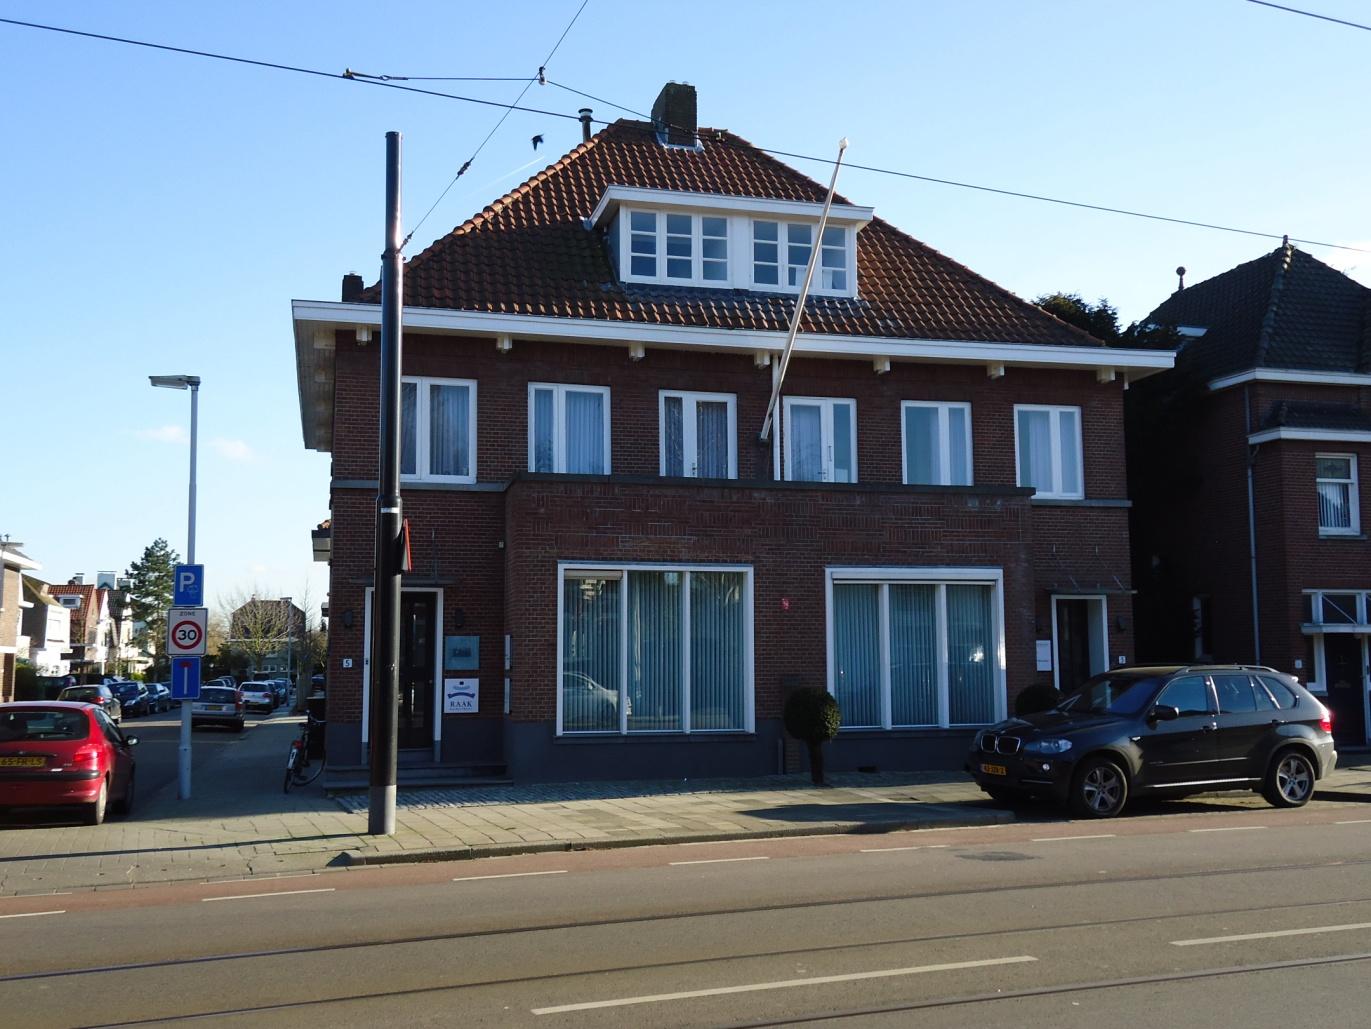 Kantoorruimte Rotterdam Bergse Dorpsstraat 3-5